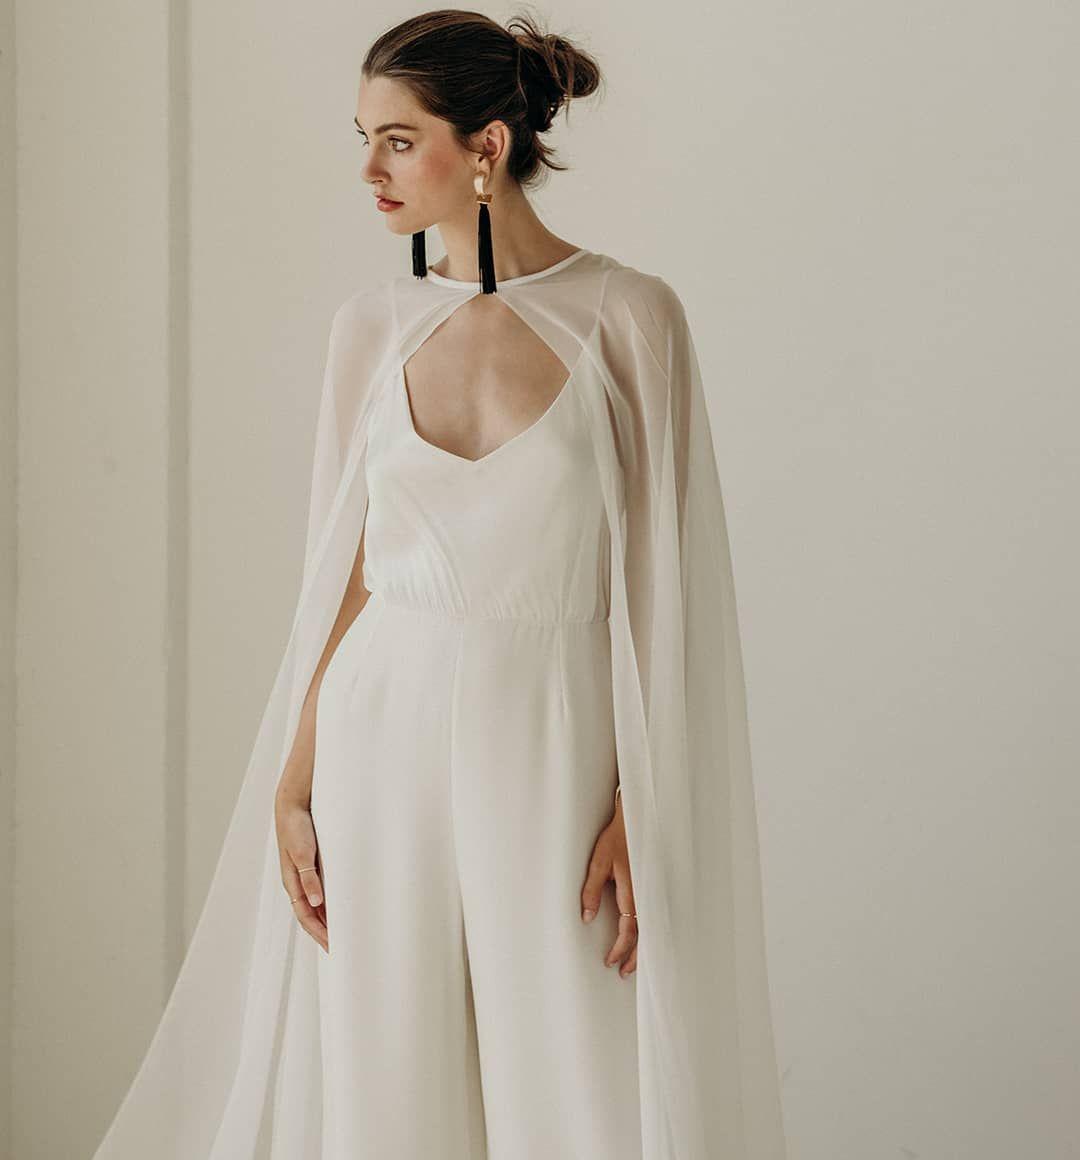 Chiffon cape paired with sleek Lily jumpsuit  Lena Medoyeff